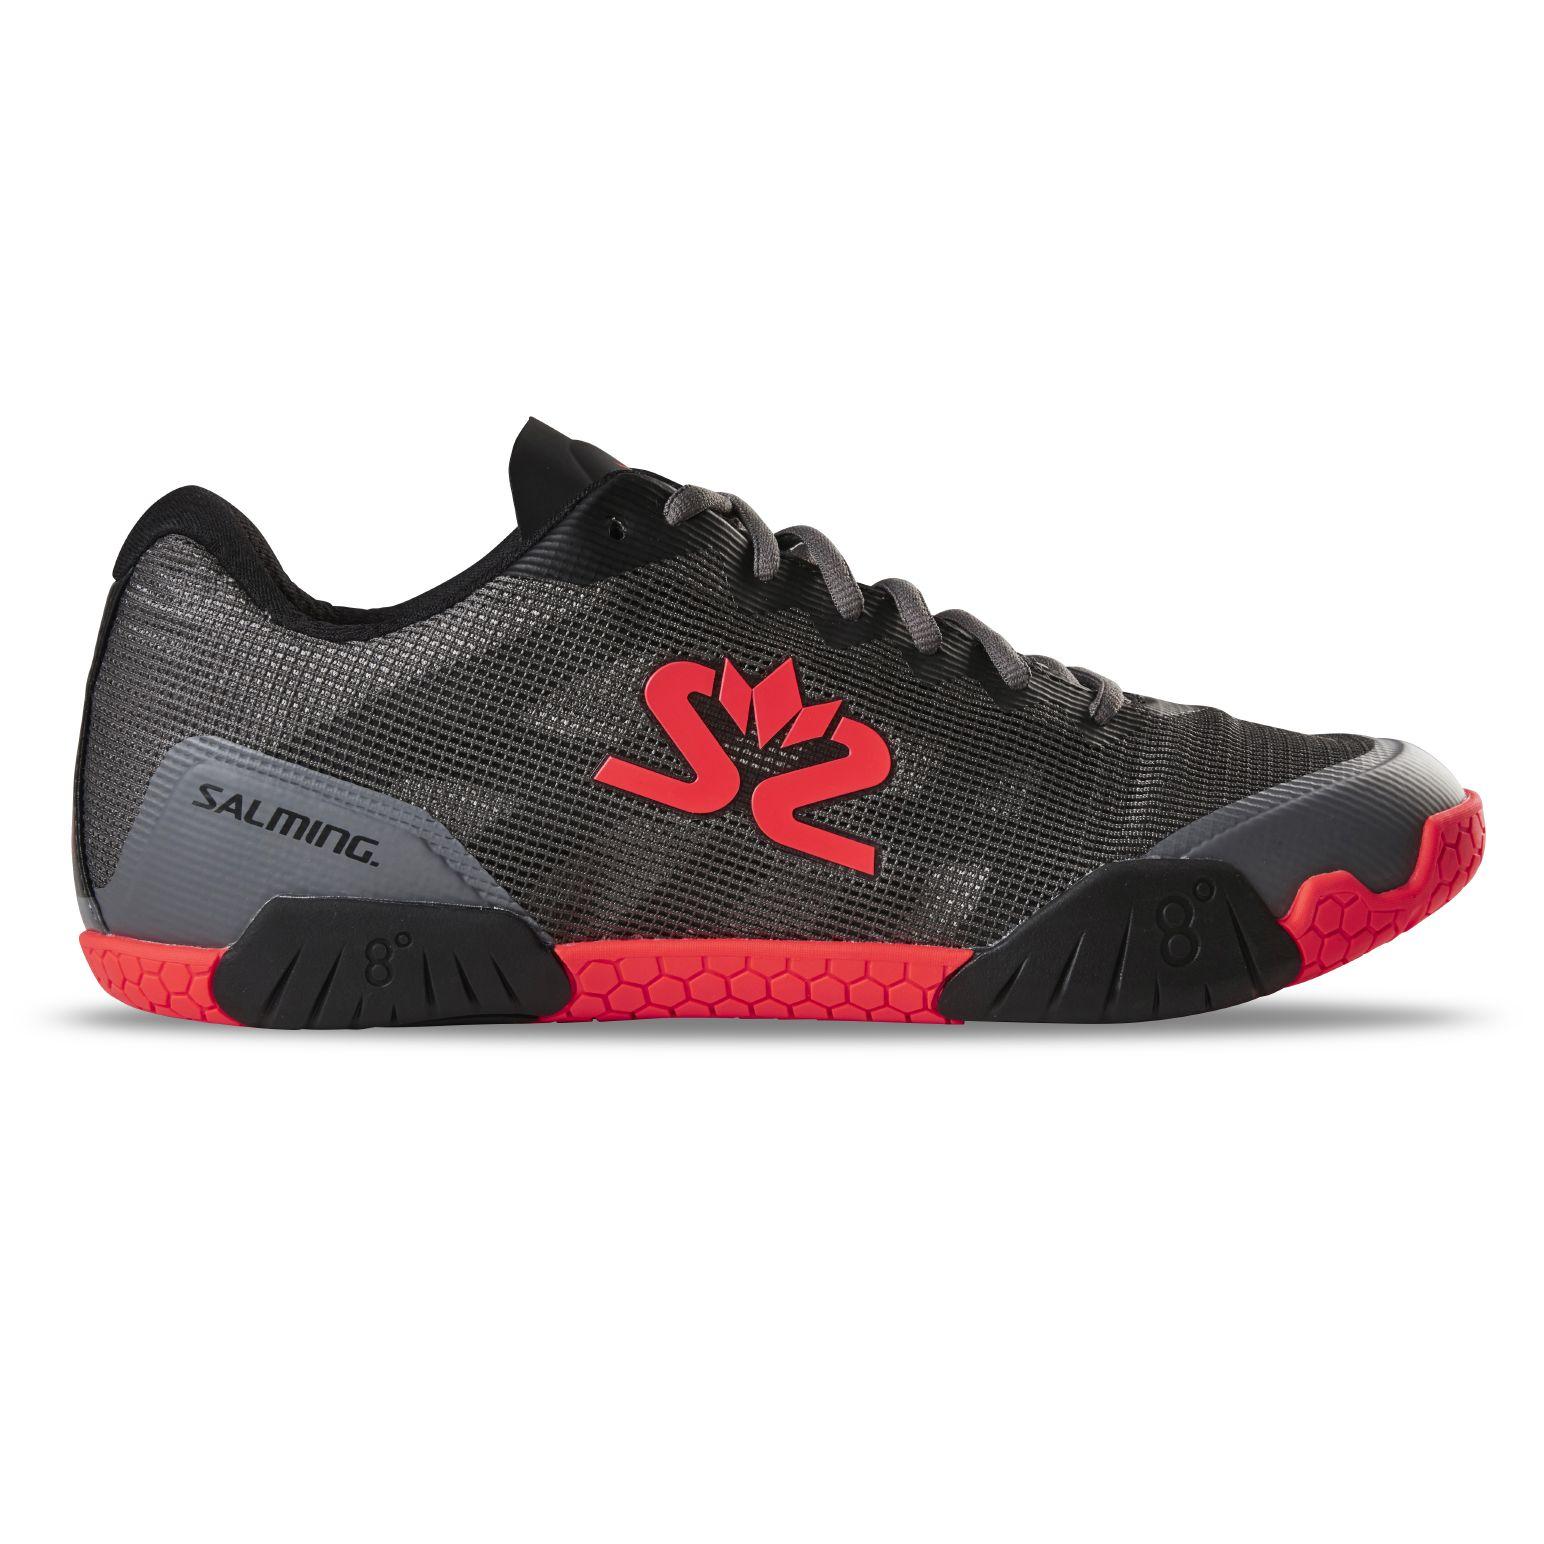 Salming Hawk Shoe Men GunMetal/Red 9,5 UK - 44 2/3 EUR - 28,5 cm